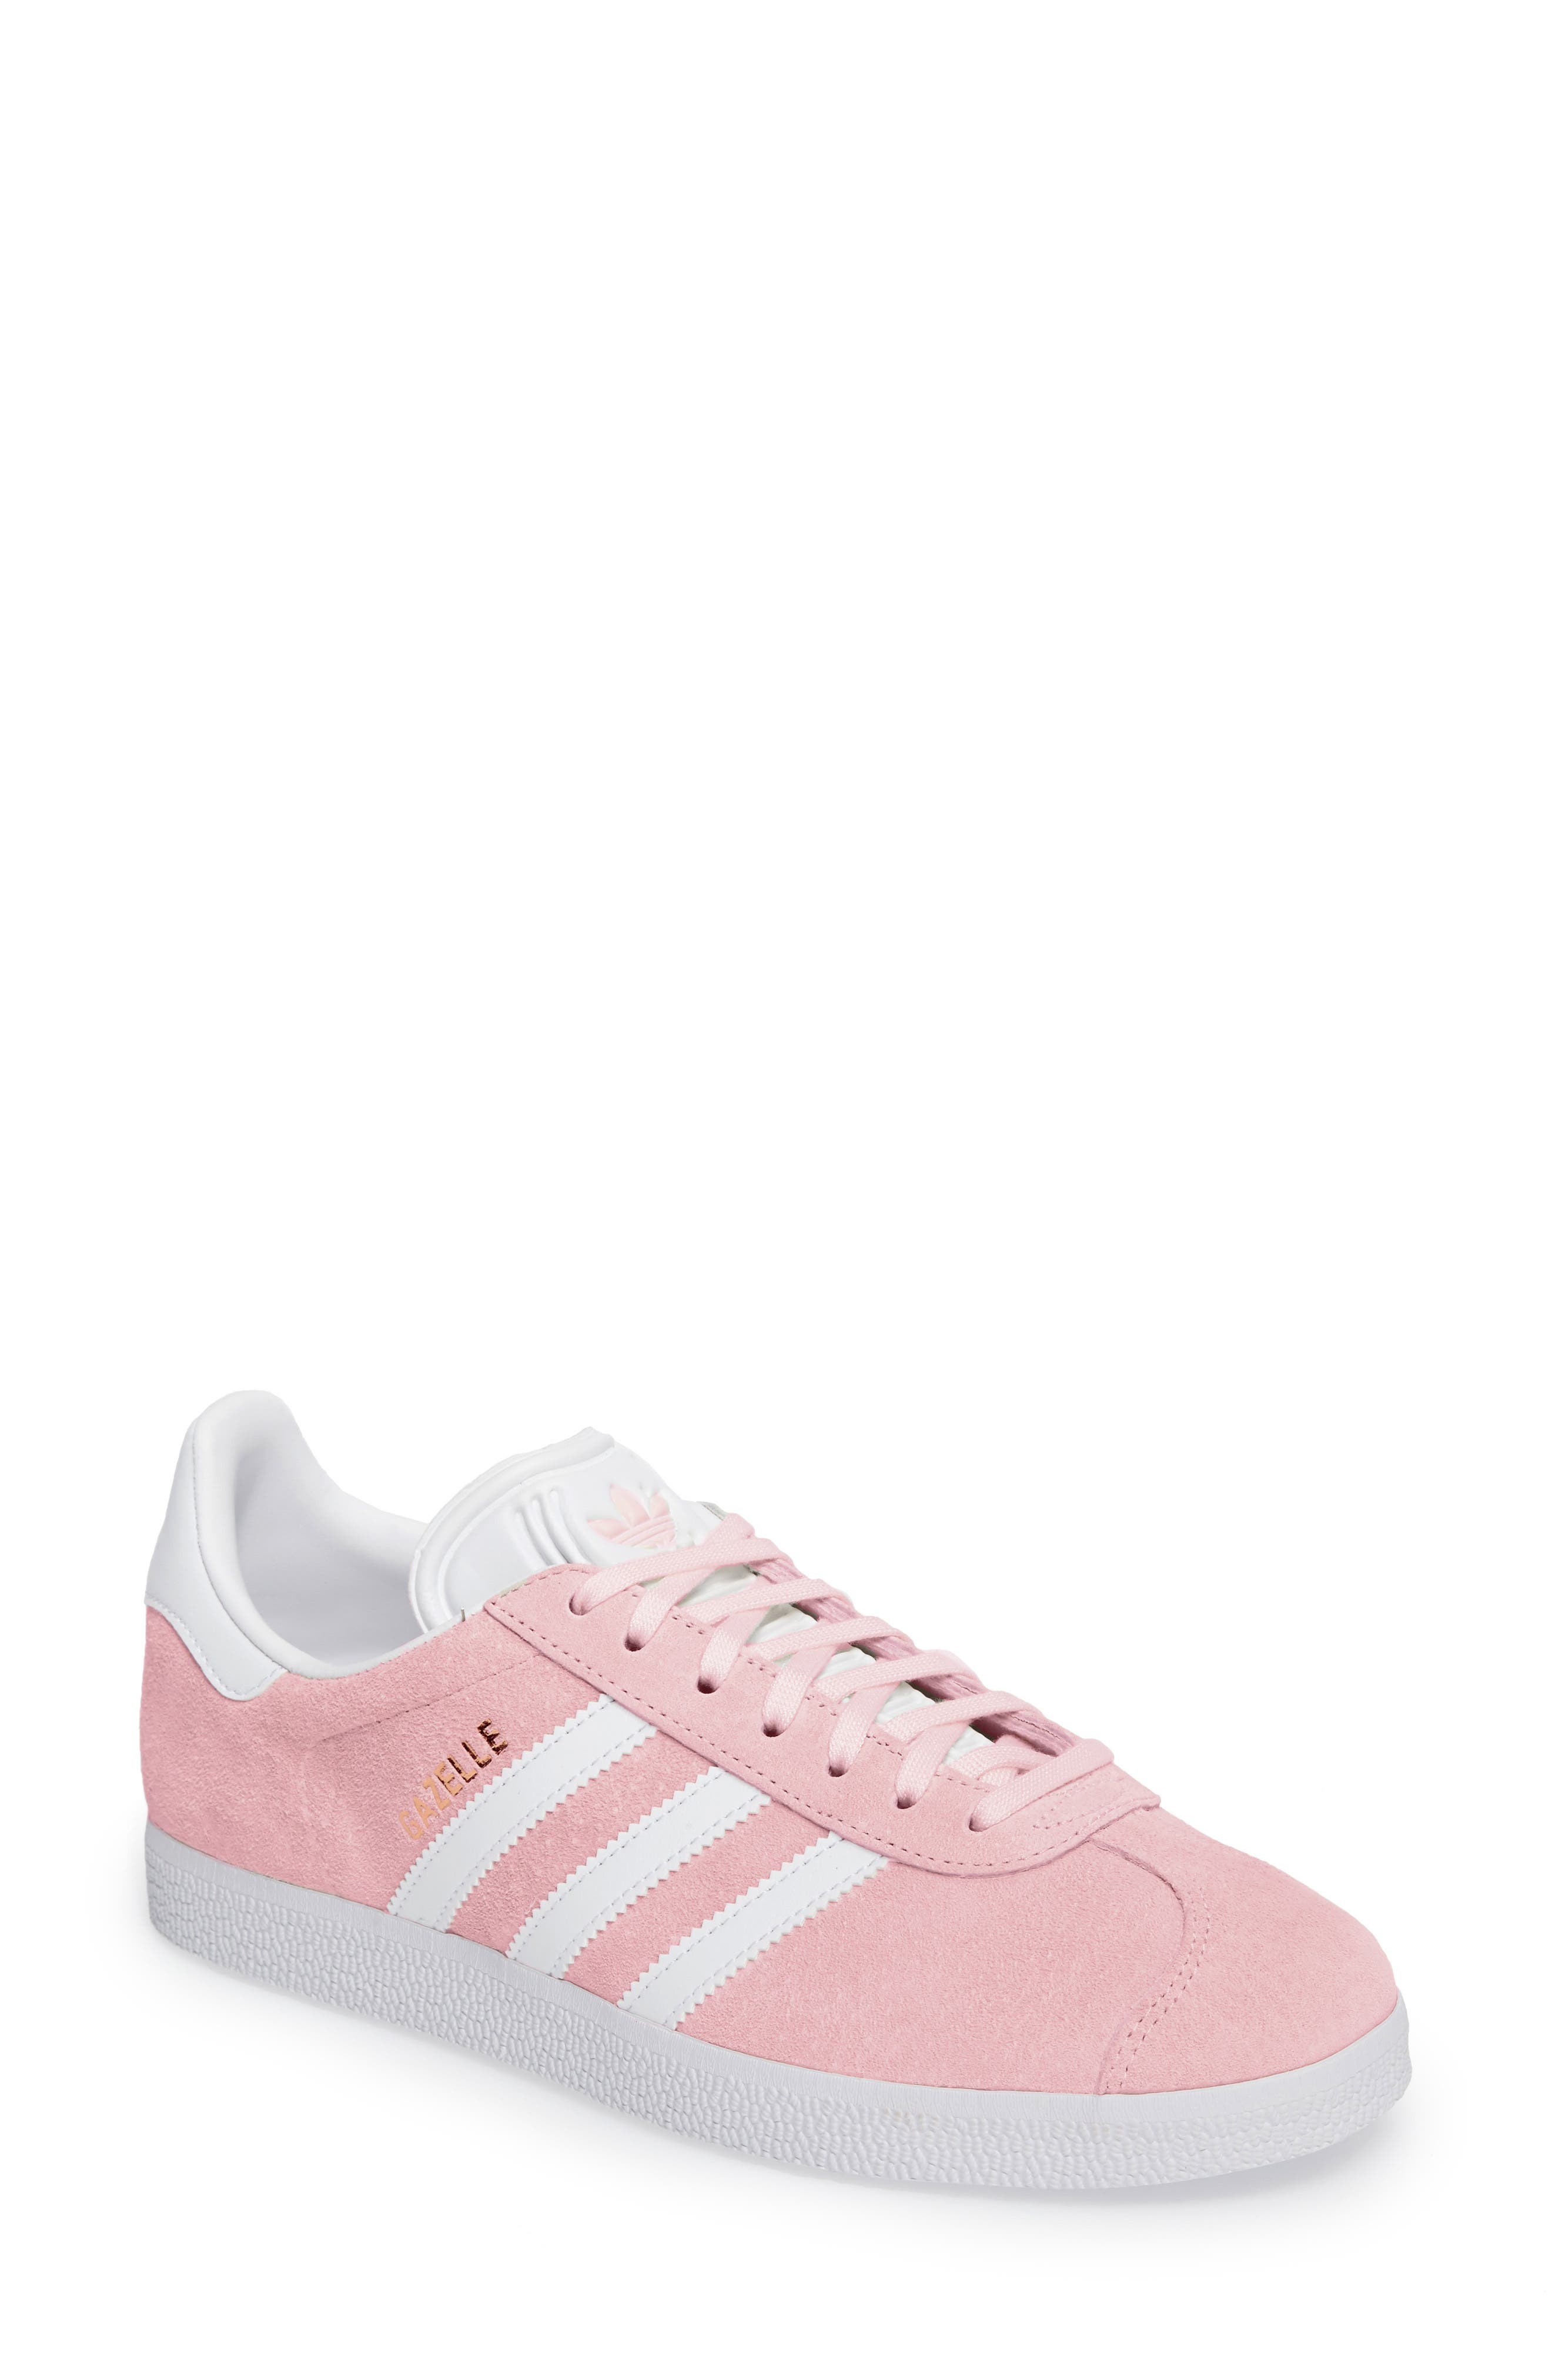 Main Image - adidas Gazelle Sneaker. Color: Wonder Pink/ White